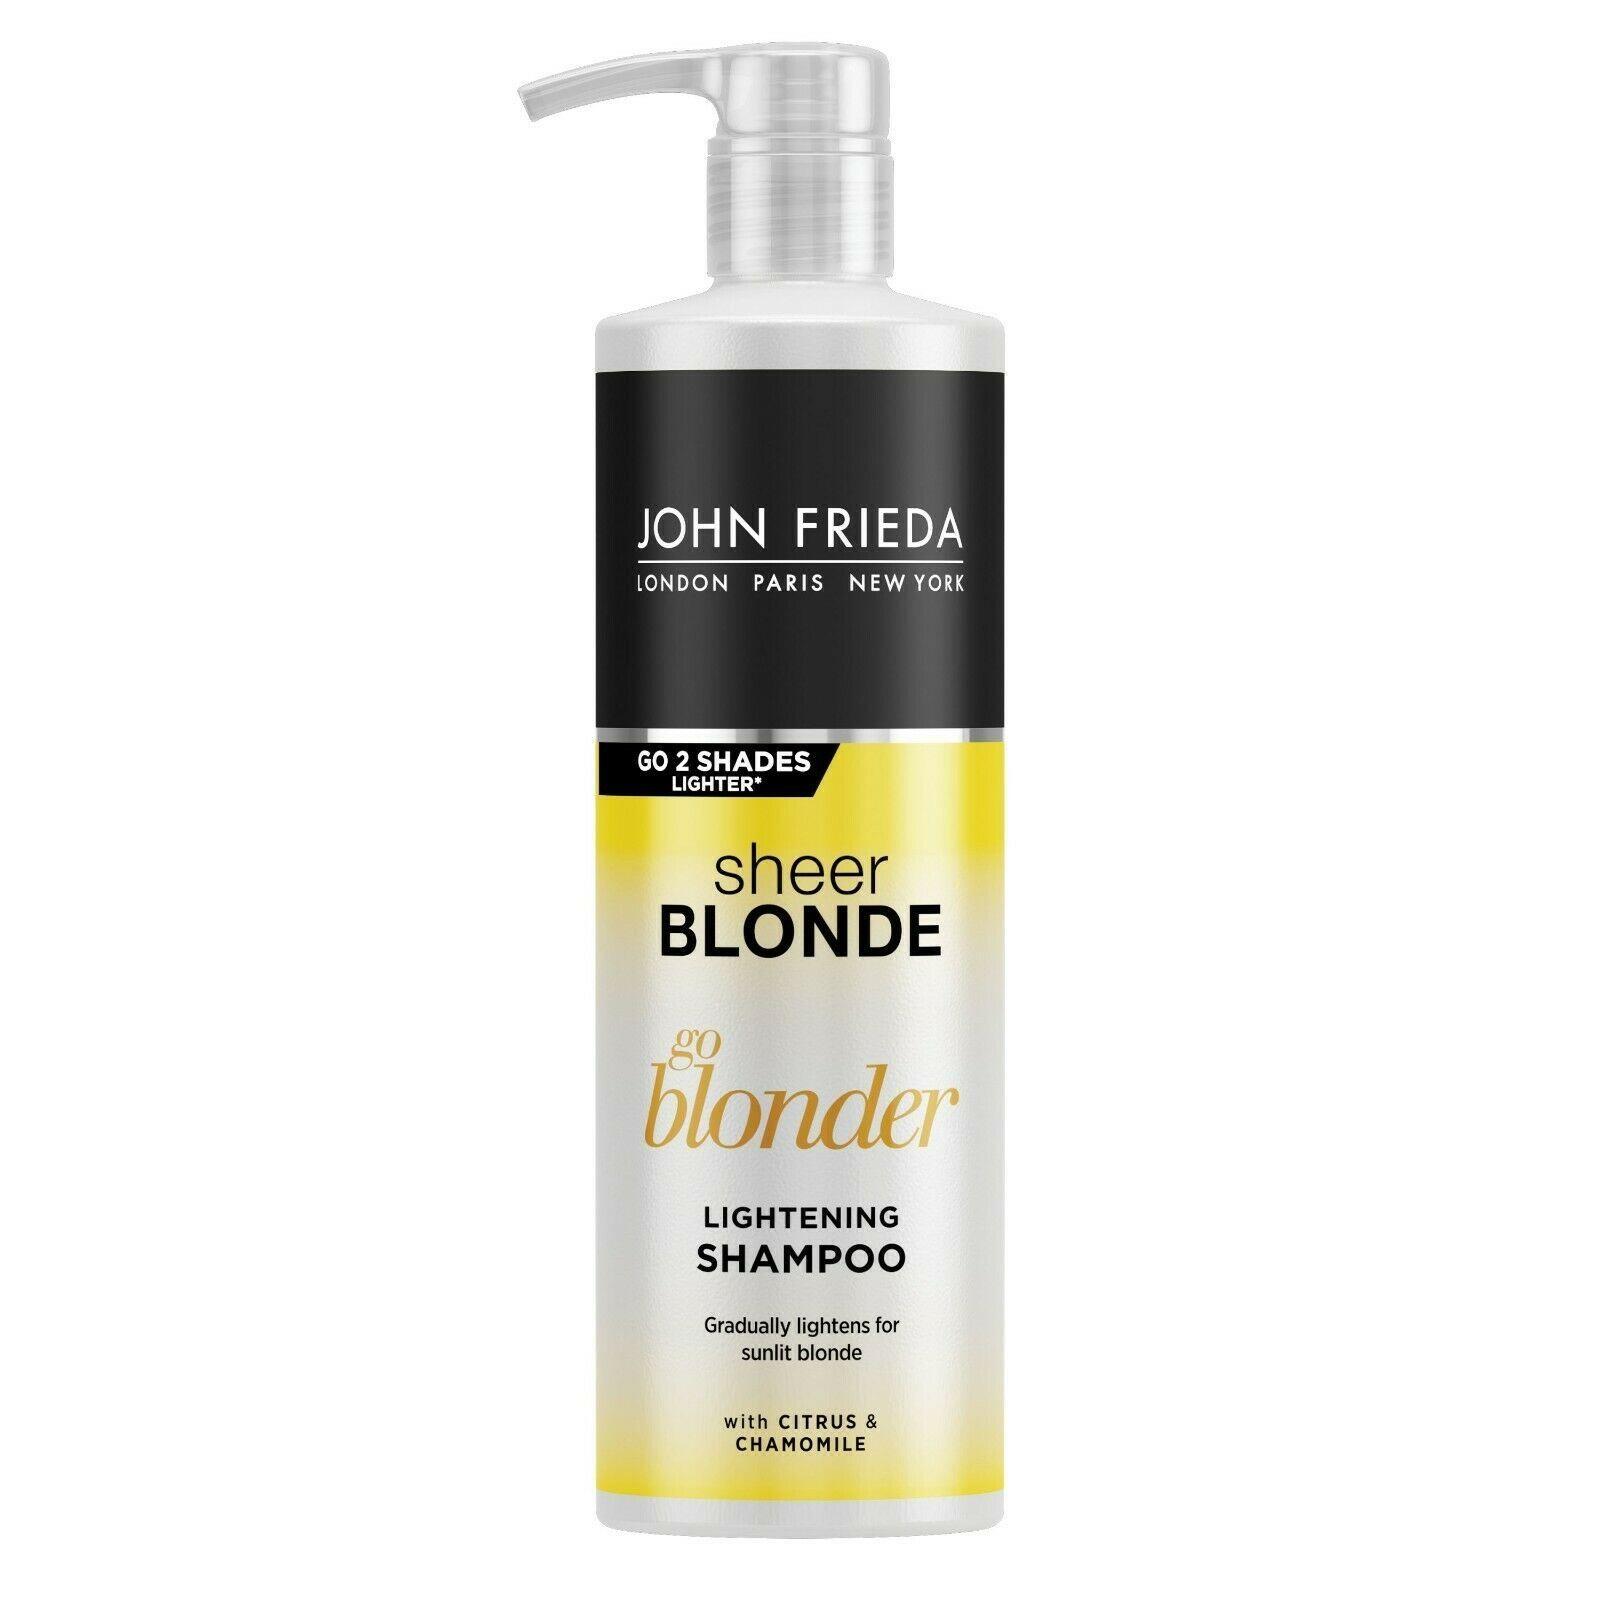 John Frieda Sheer Blonde Go Blonder Lightening Shampoo & Conditioner 500ml Duo Pack